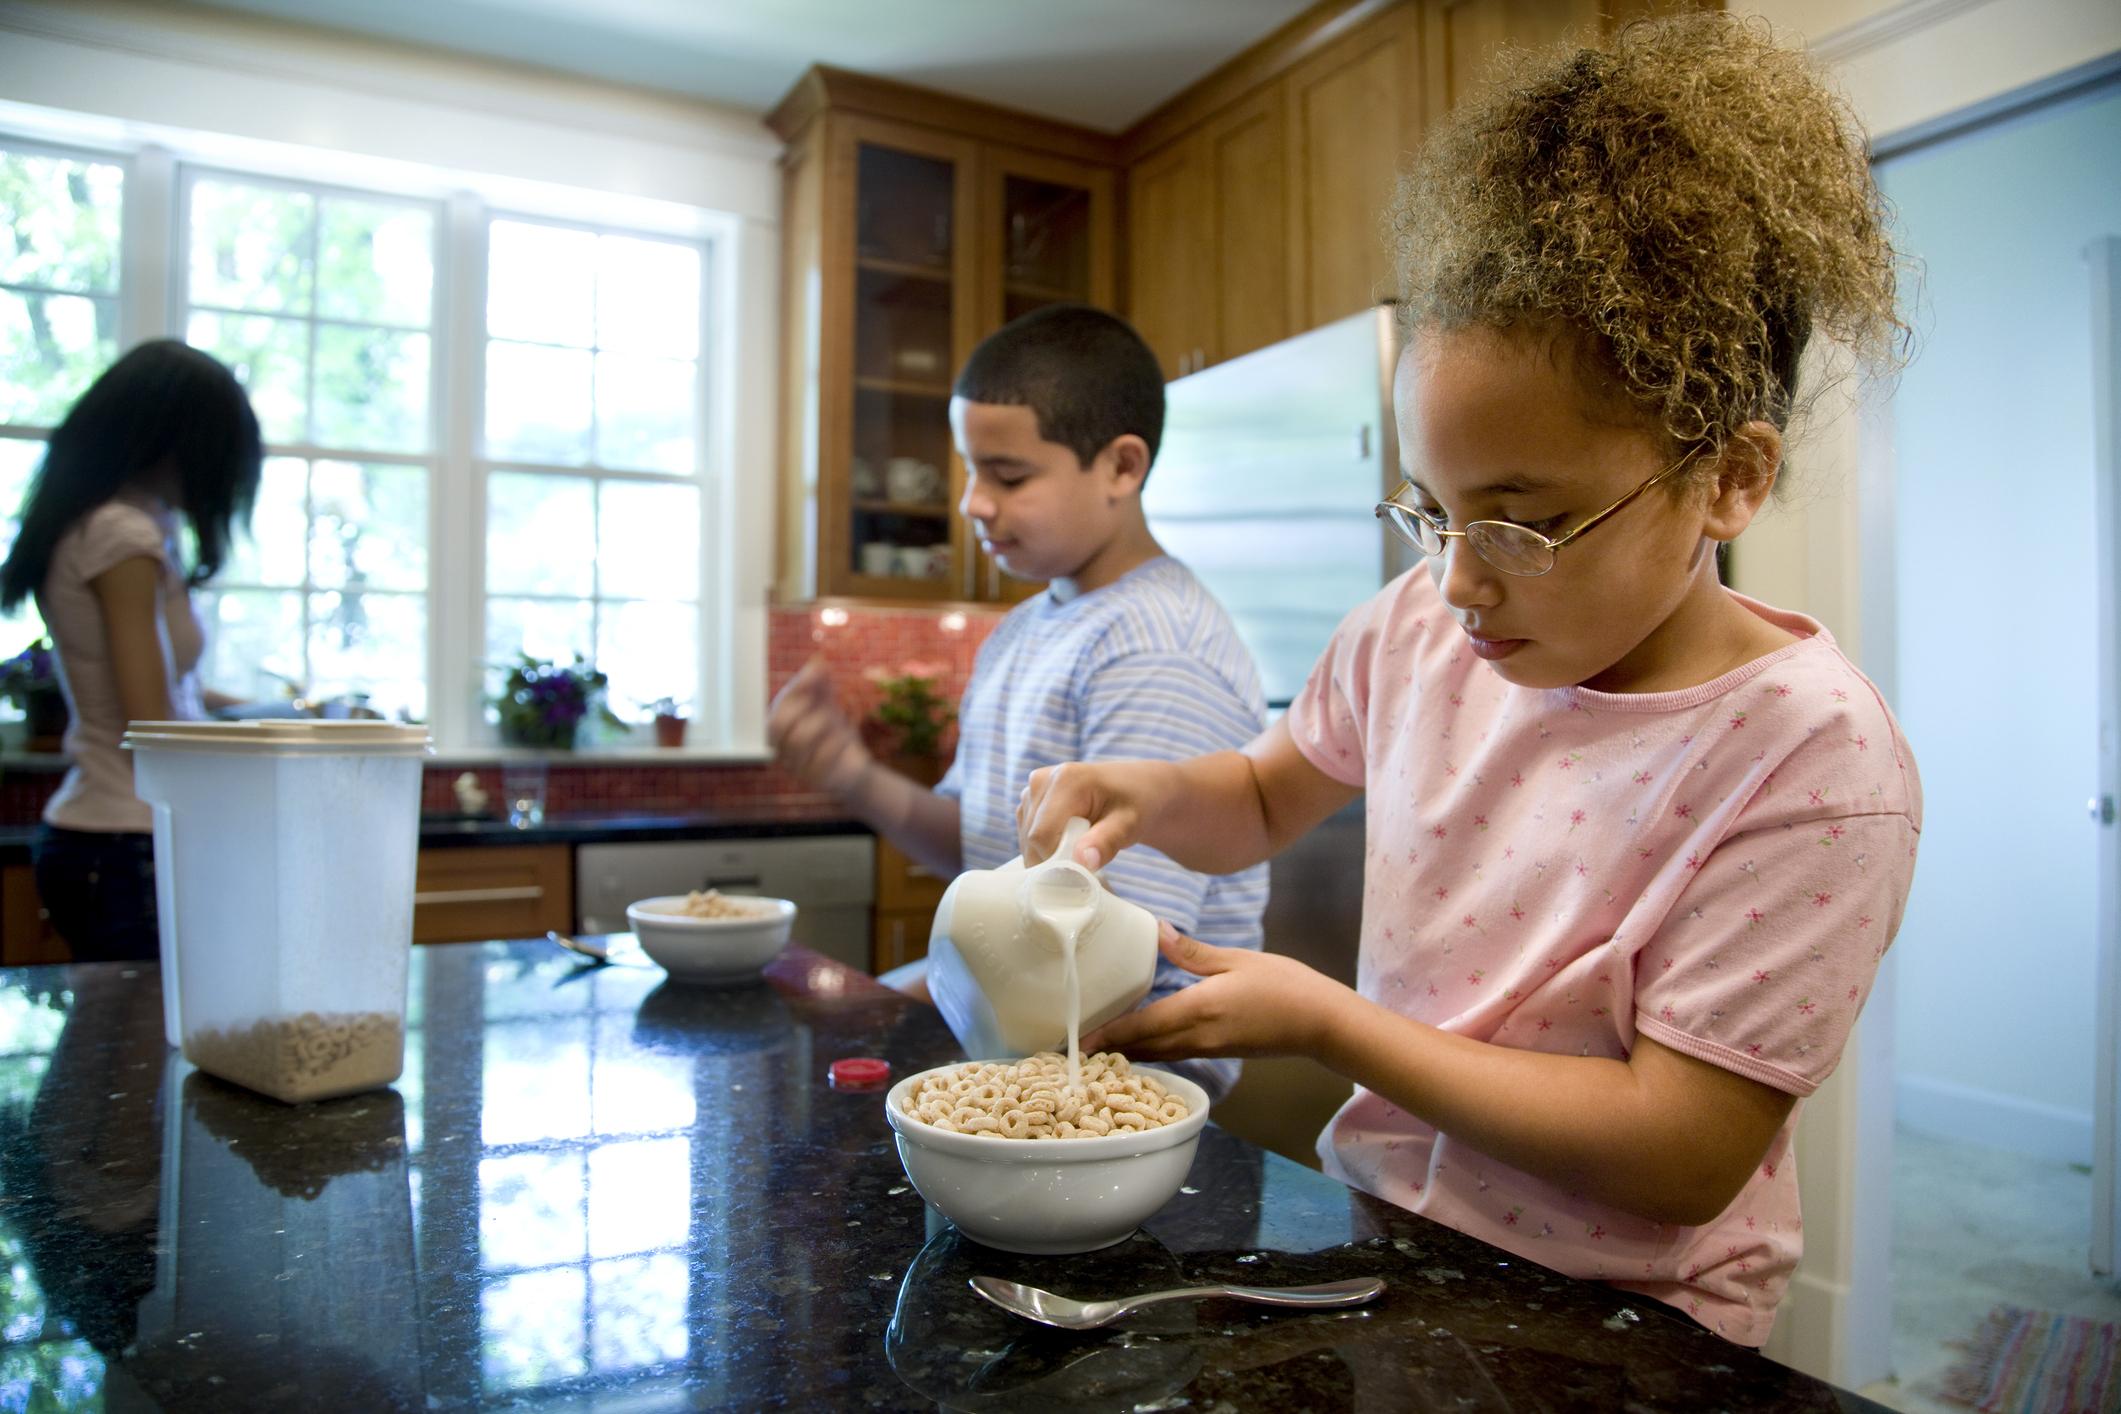 Kids eating cereal.